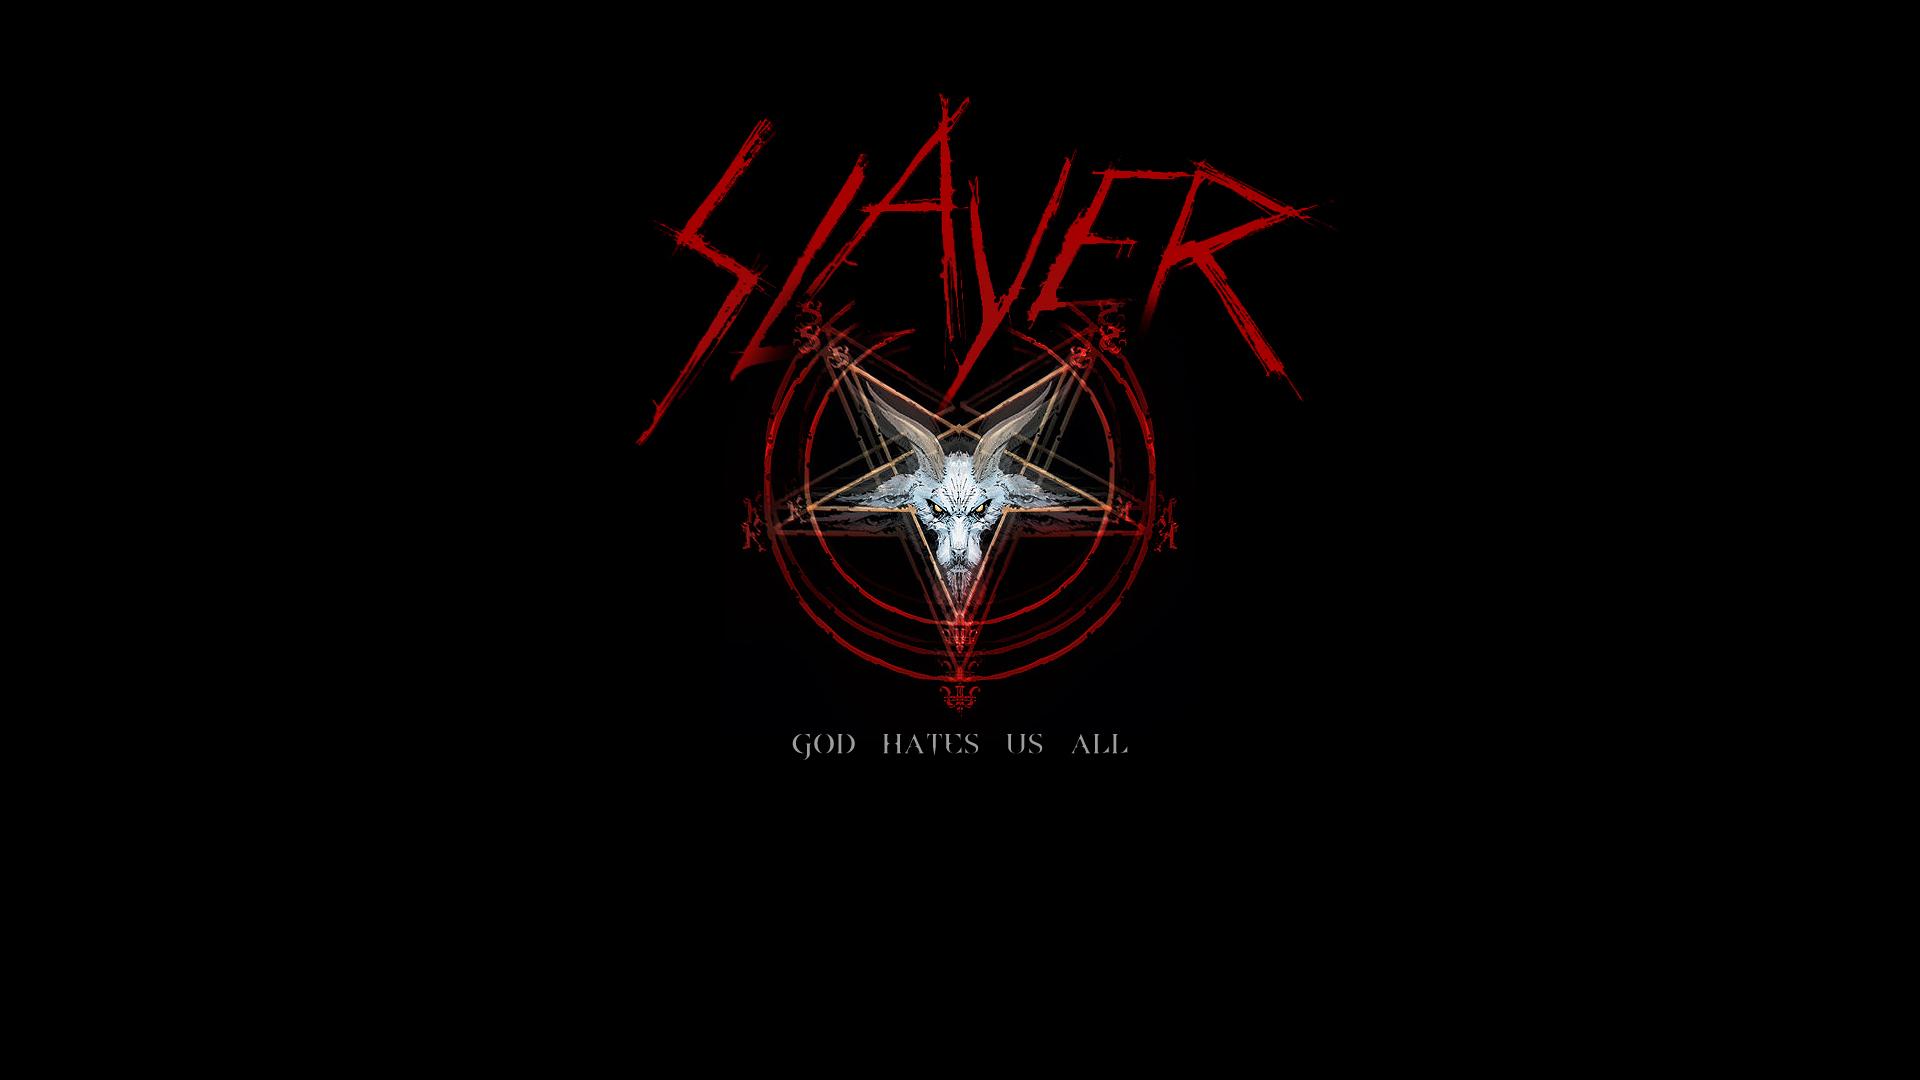 Slayer HD Wallpaper